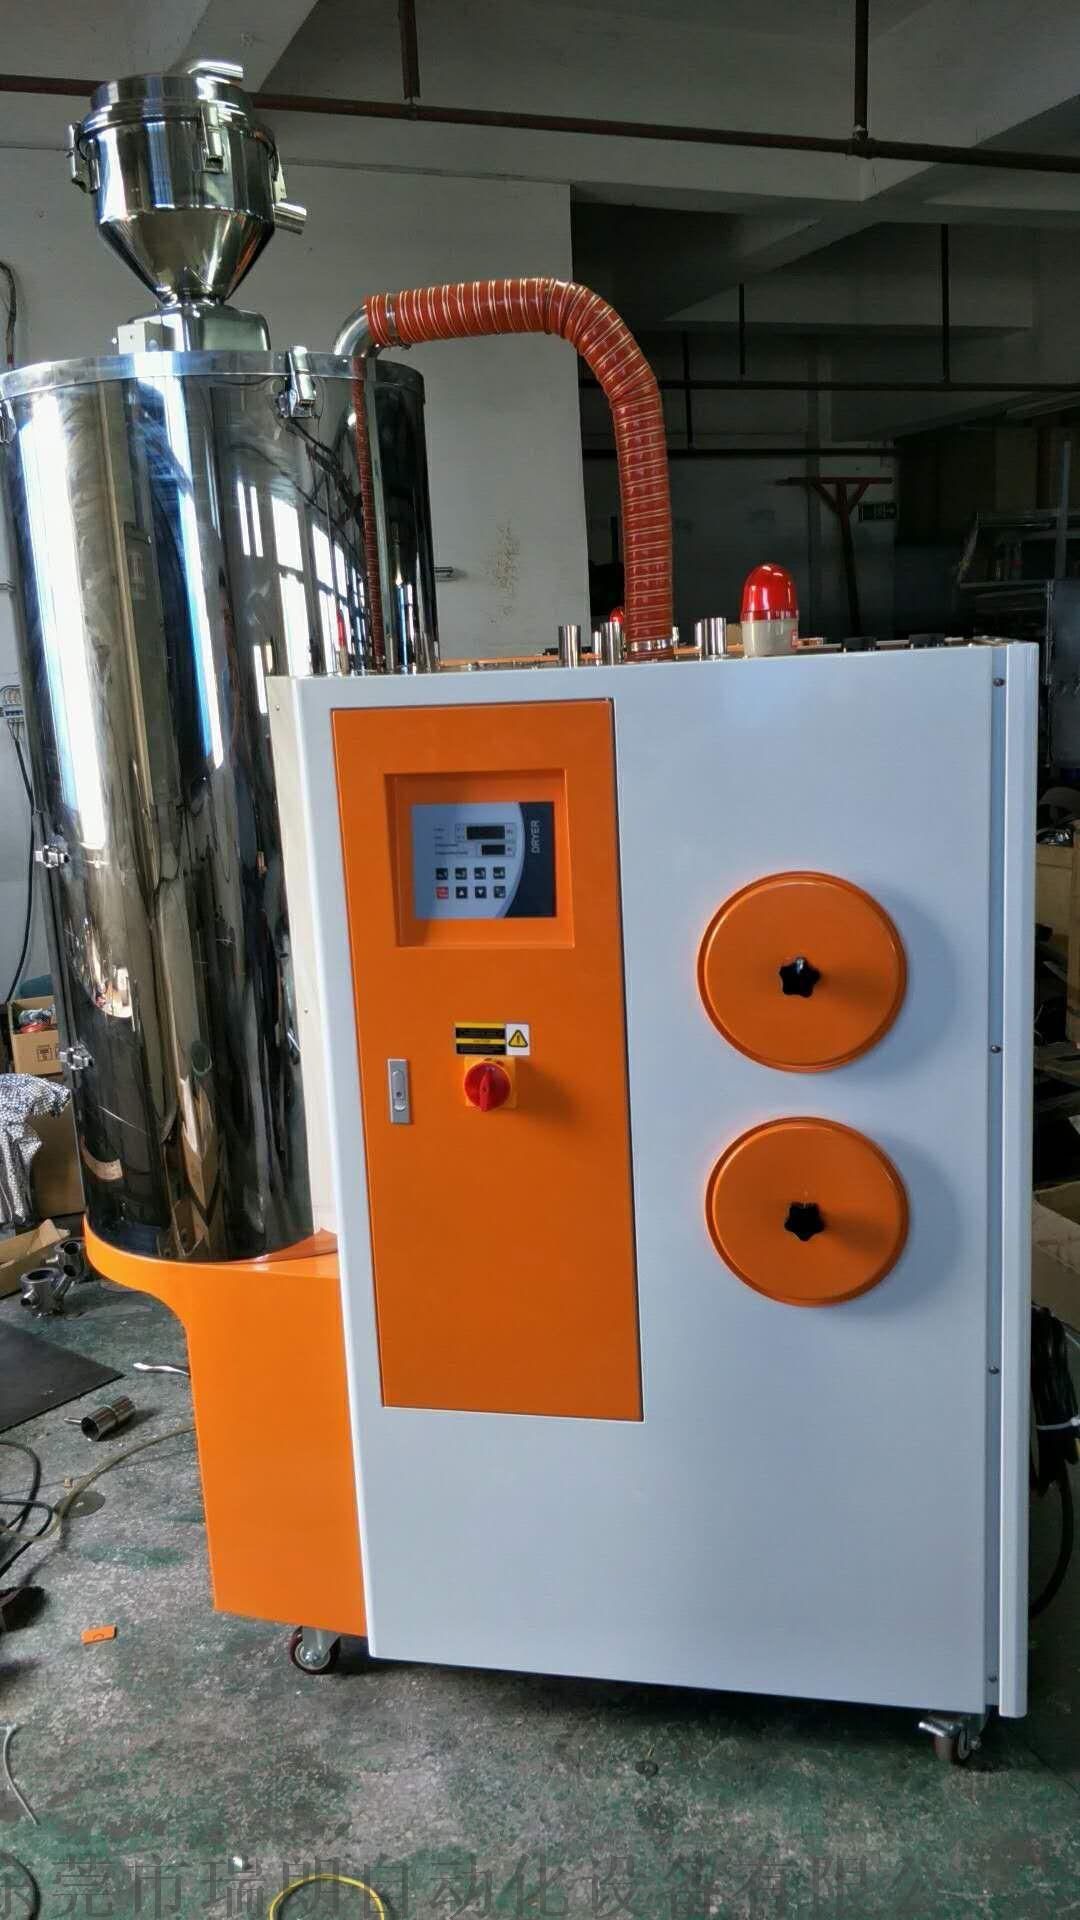 RLSH-50除湿机,三合一体输送除湿机801581515